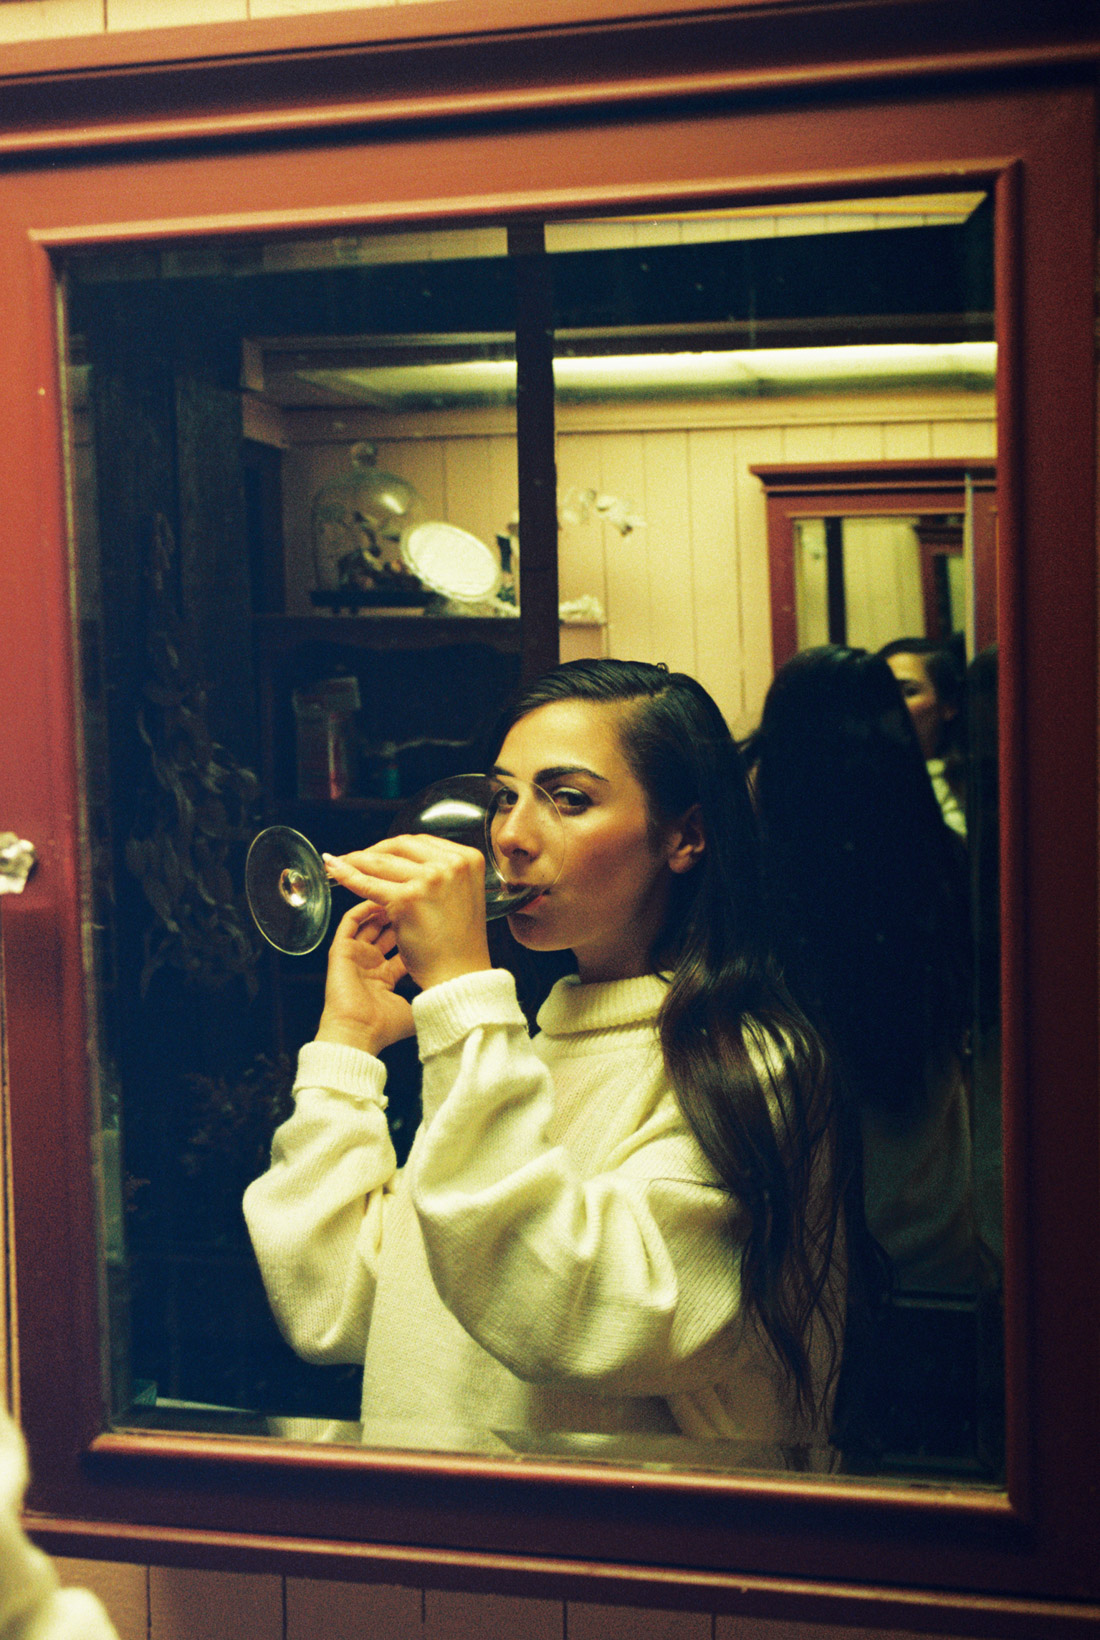 Cara drinking wine in the bathroom